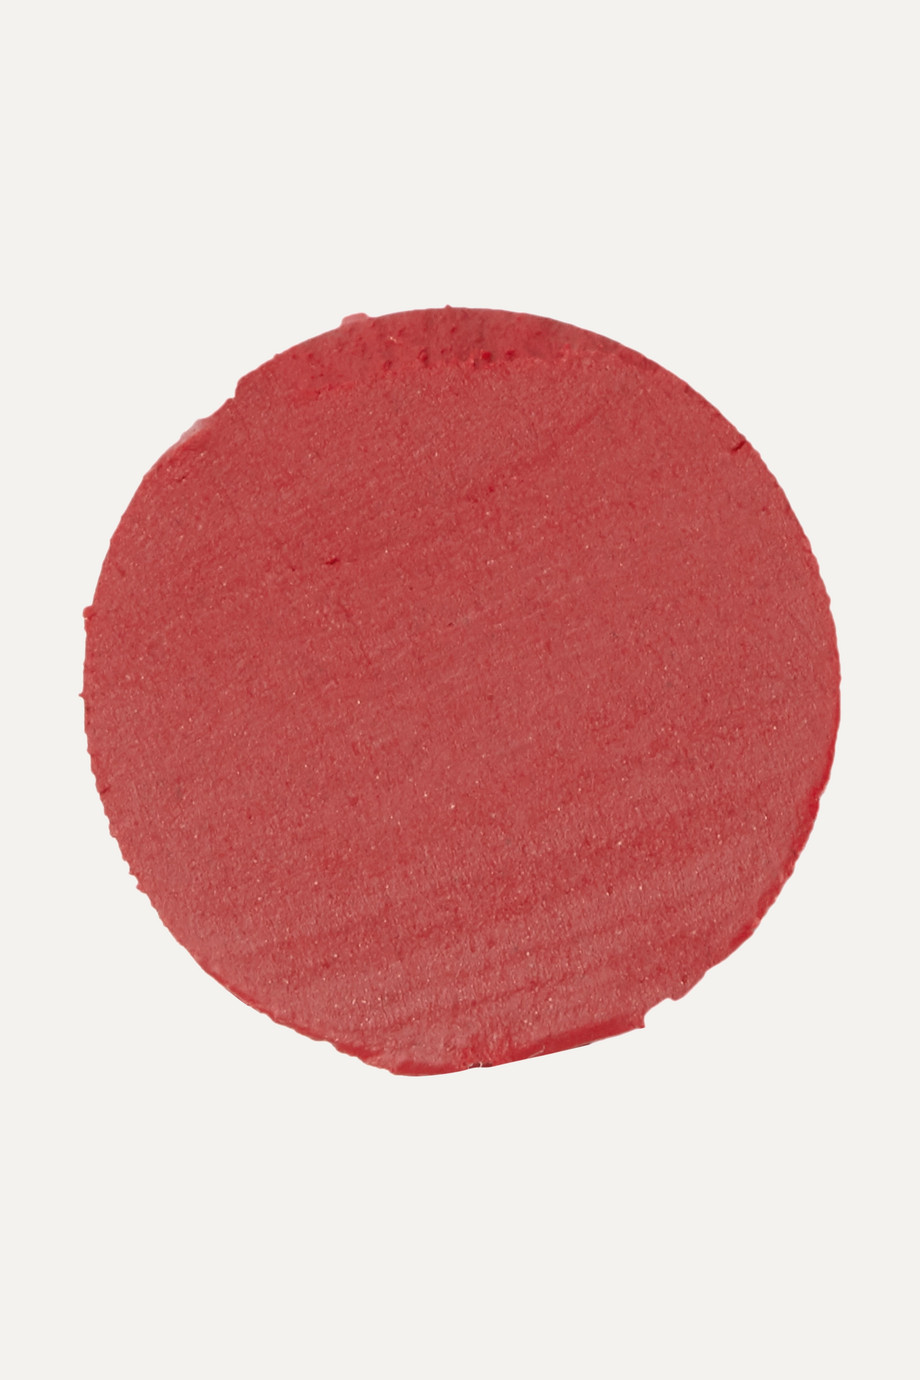 Charlotte Tilbury Hot Lips 2 Lipstick - Carina's Star